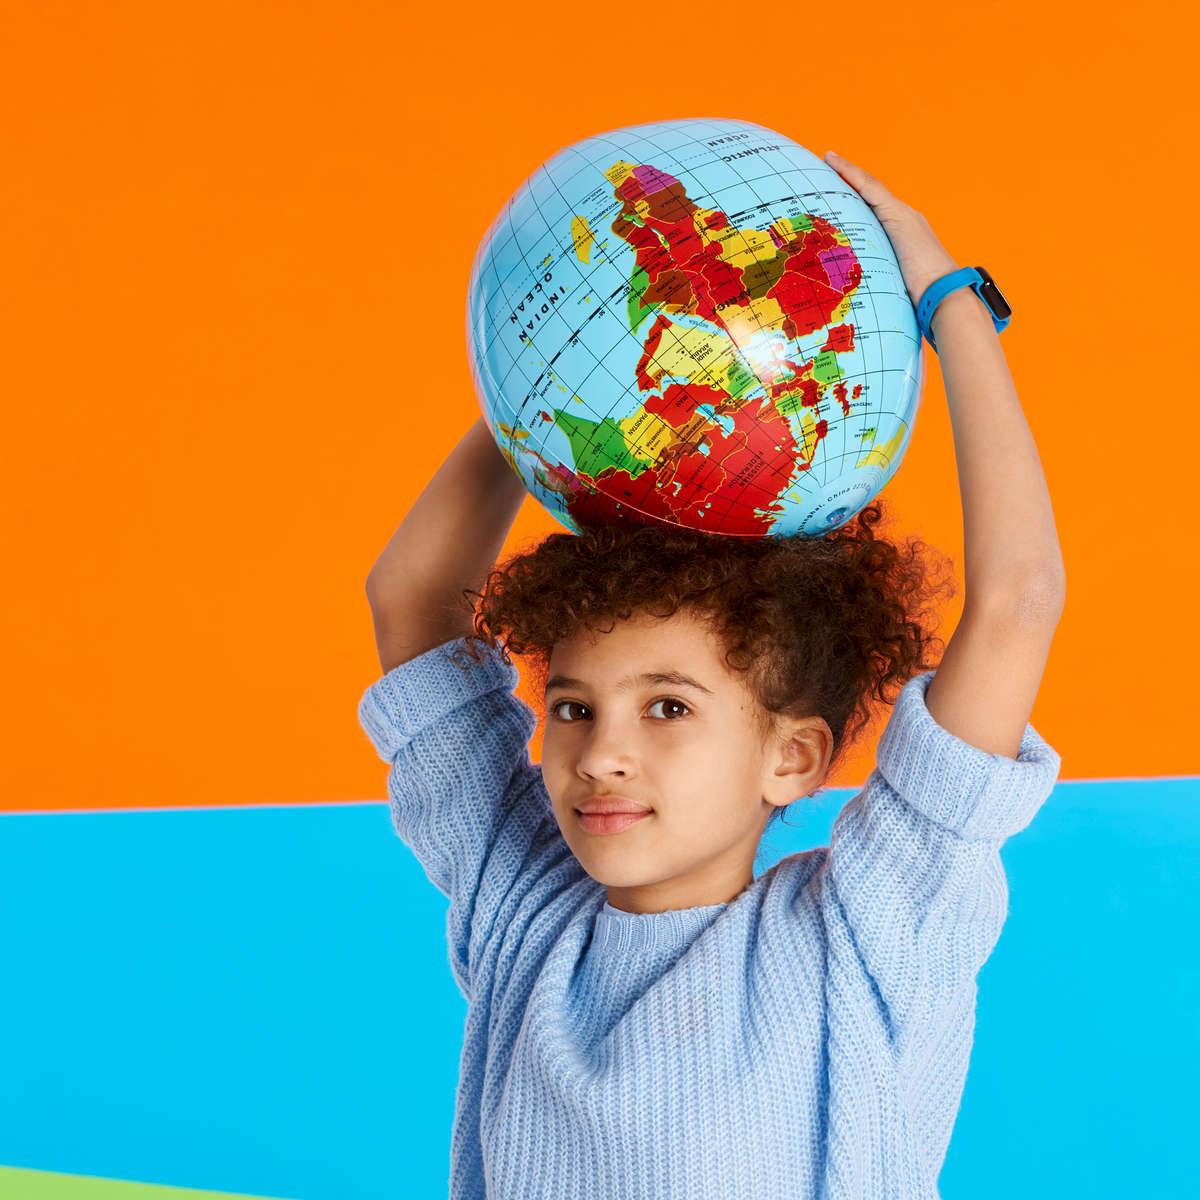 WinkyLewis-UNICEF_CAMPAIGN_ADALIBERSON_031517_2090